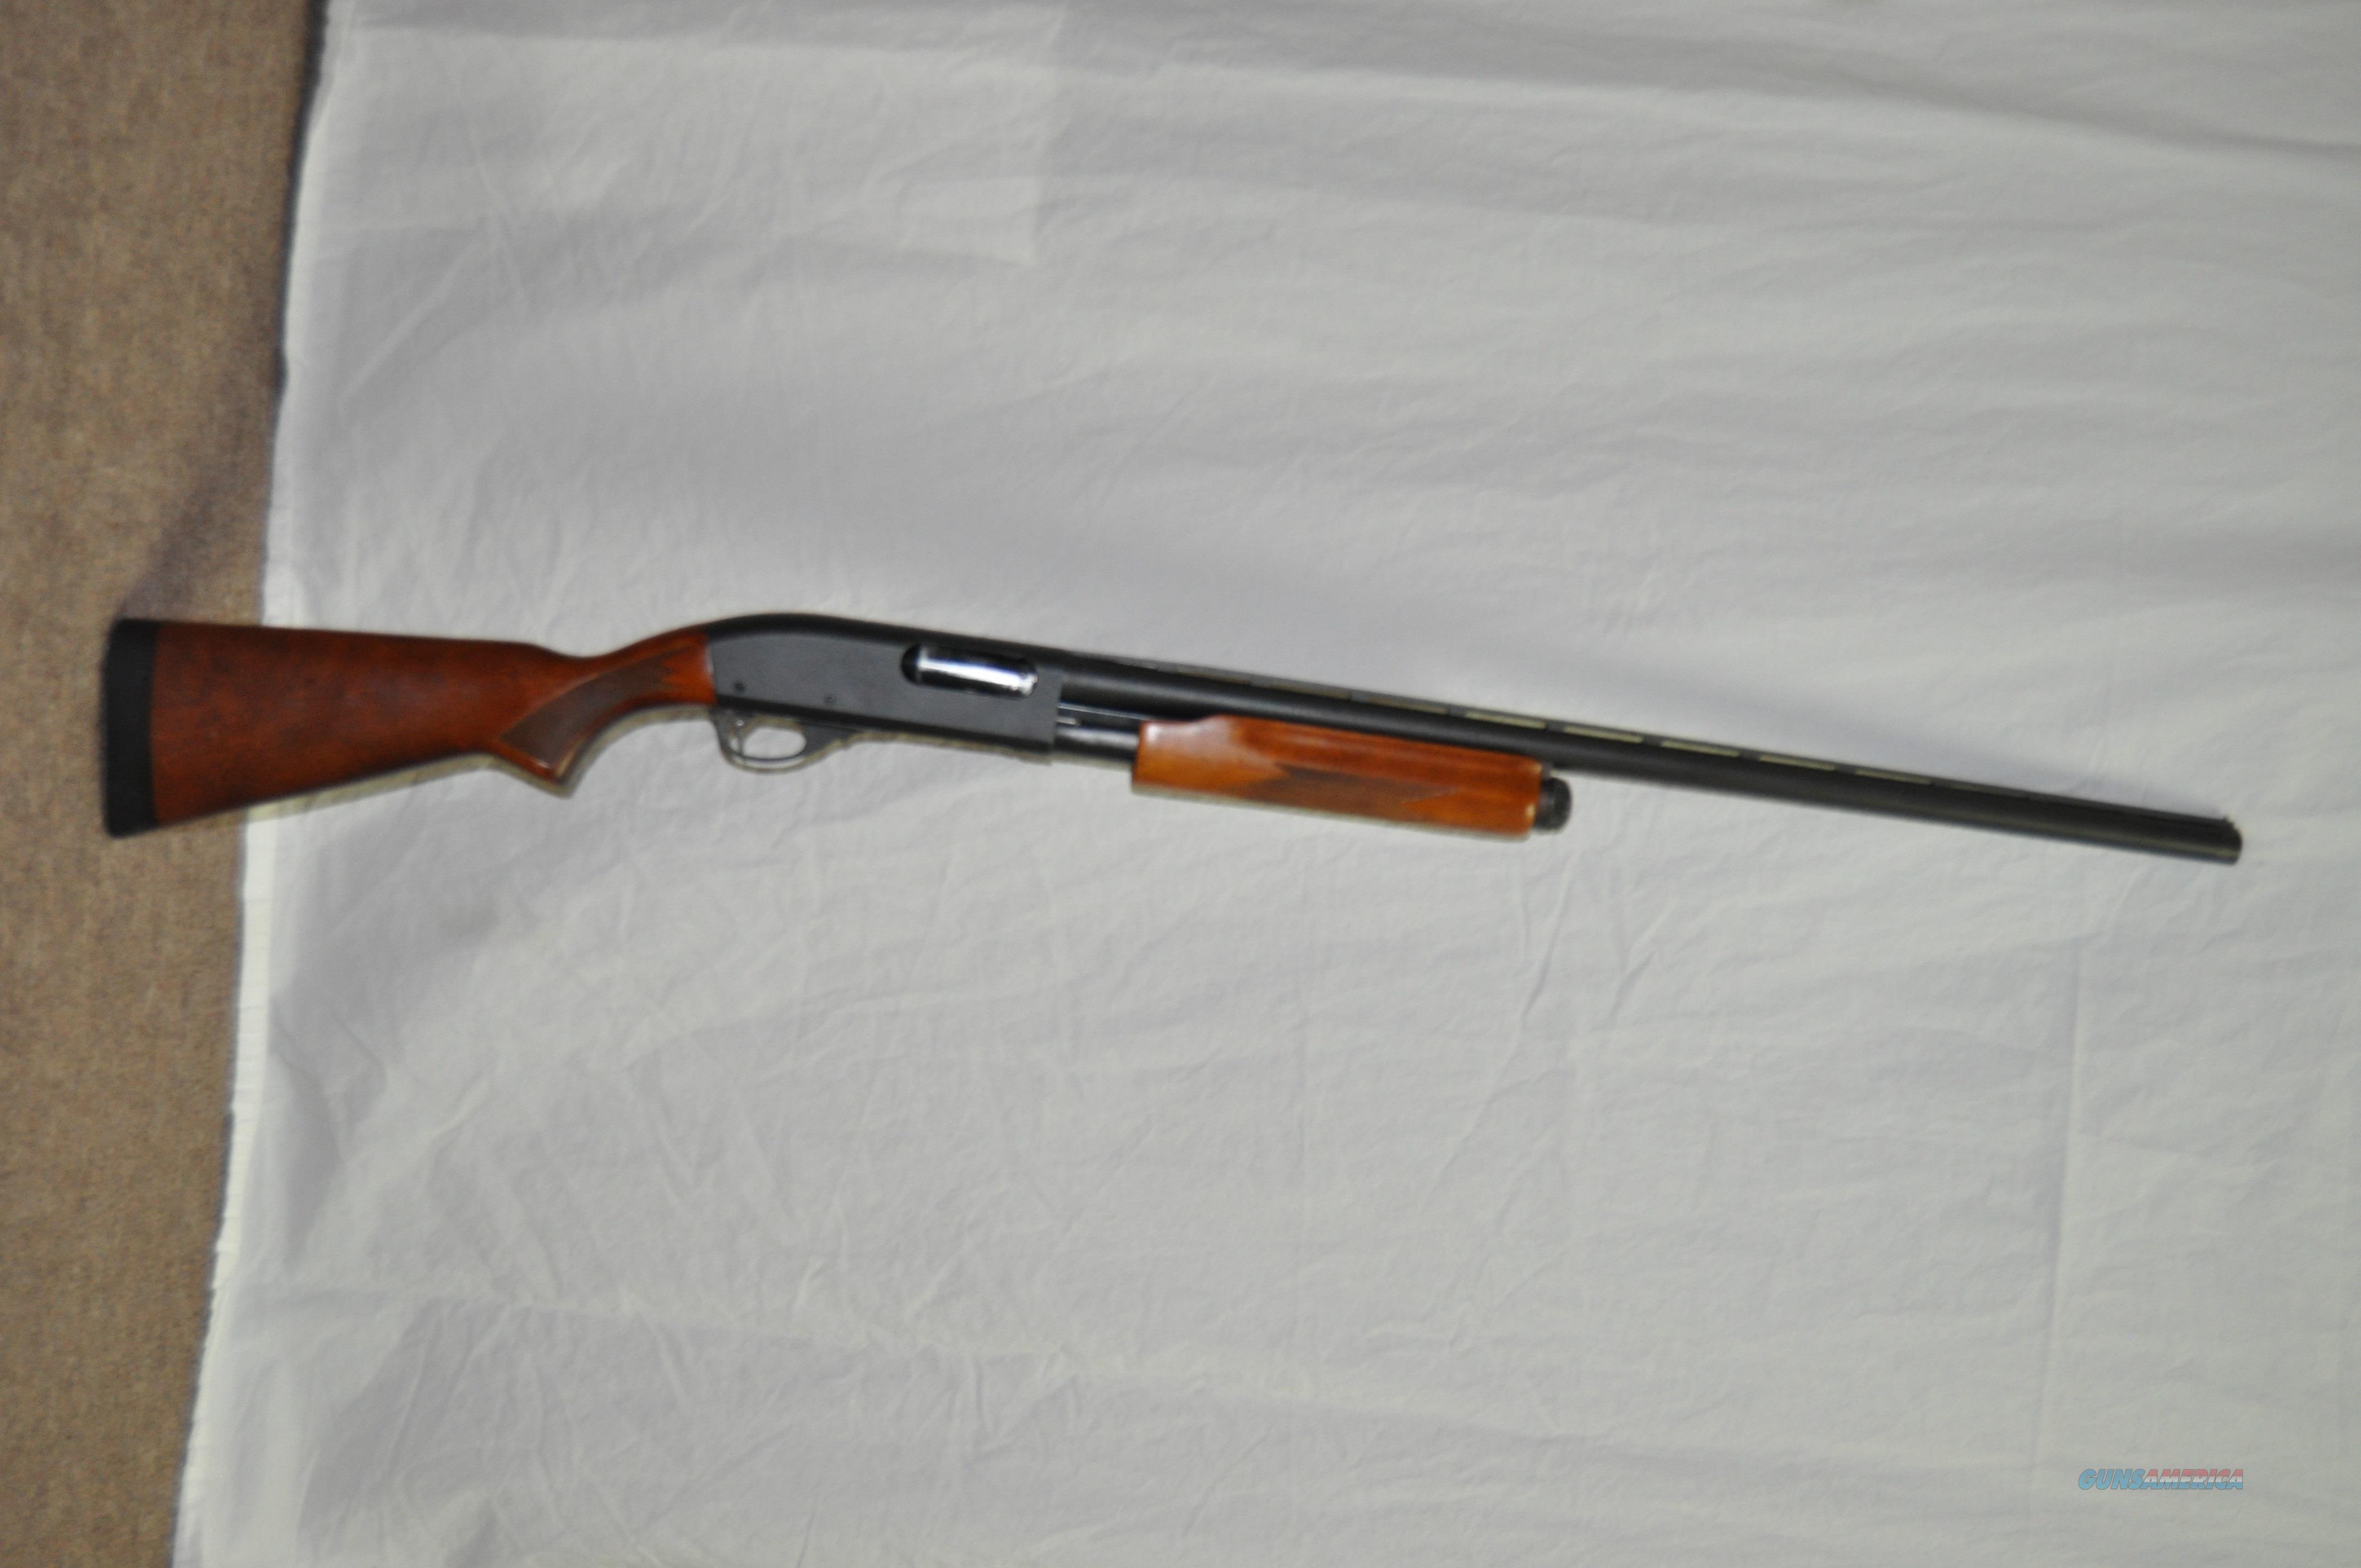 Remington 870 Express 12ga 3in Chamber  Guns > Shotguns > Remington Shotguns  > Pump > Hunting